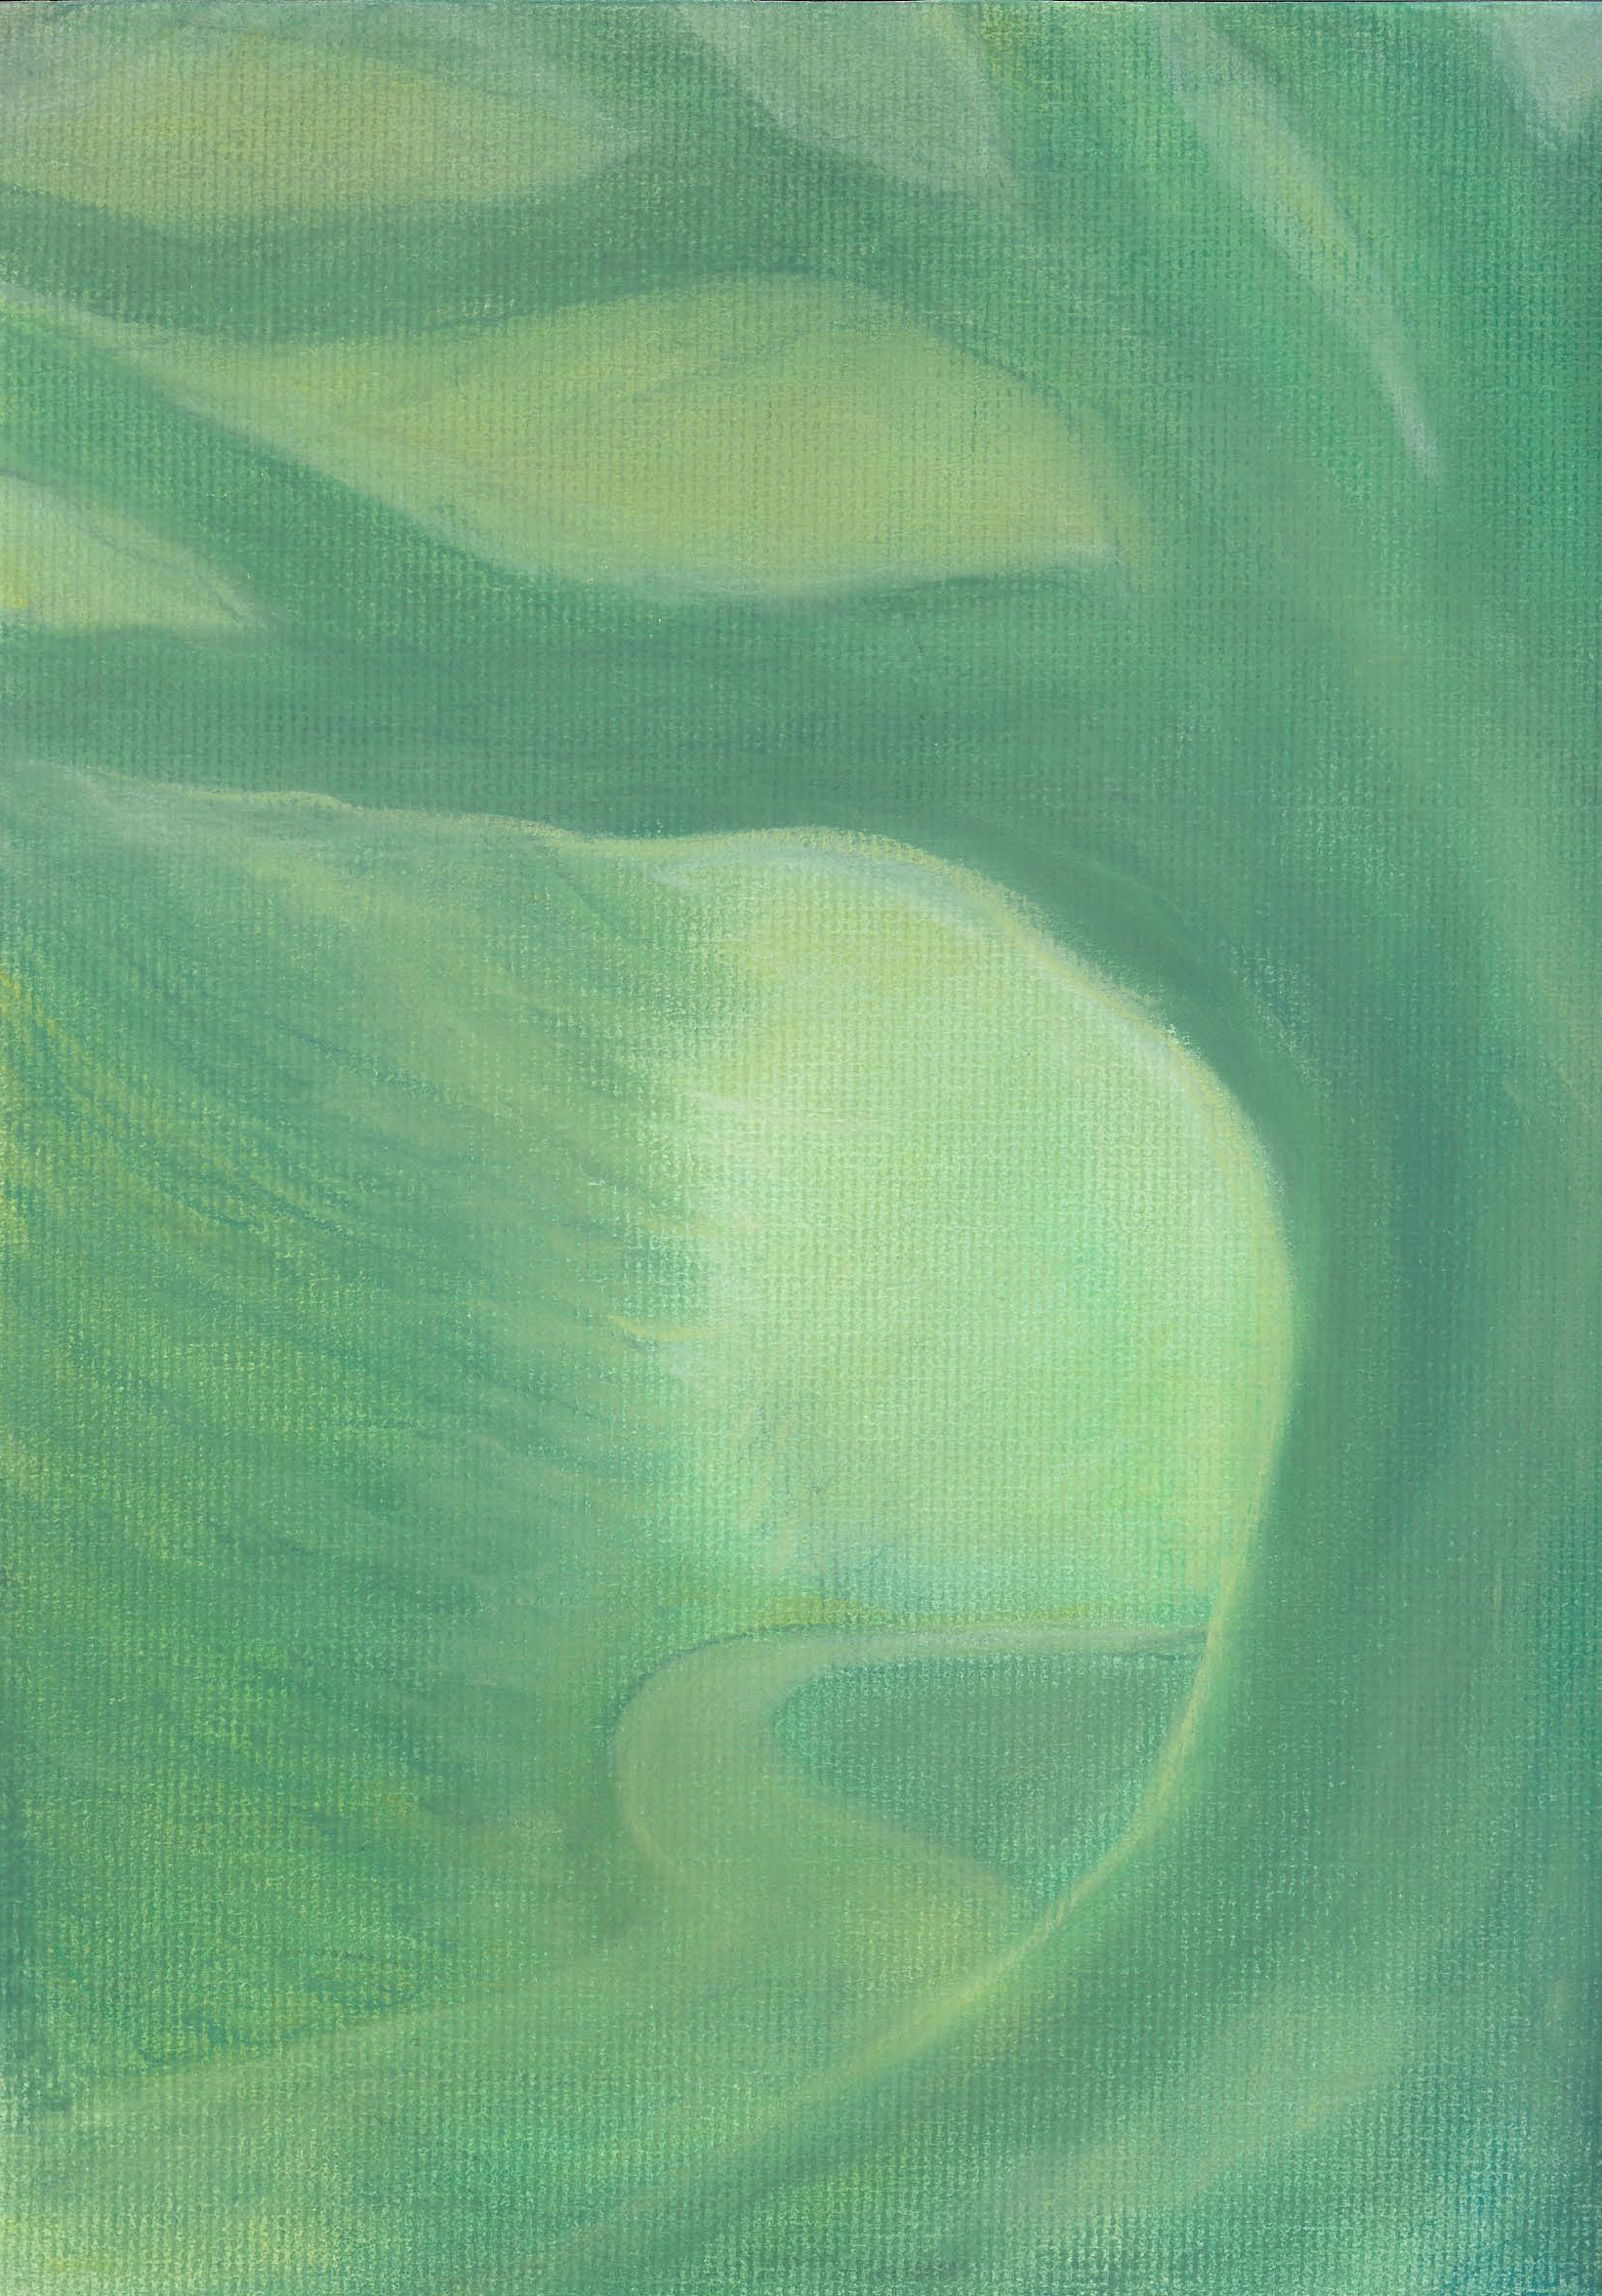 Gone Green - Pastel - 9 X 12 - $125